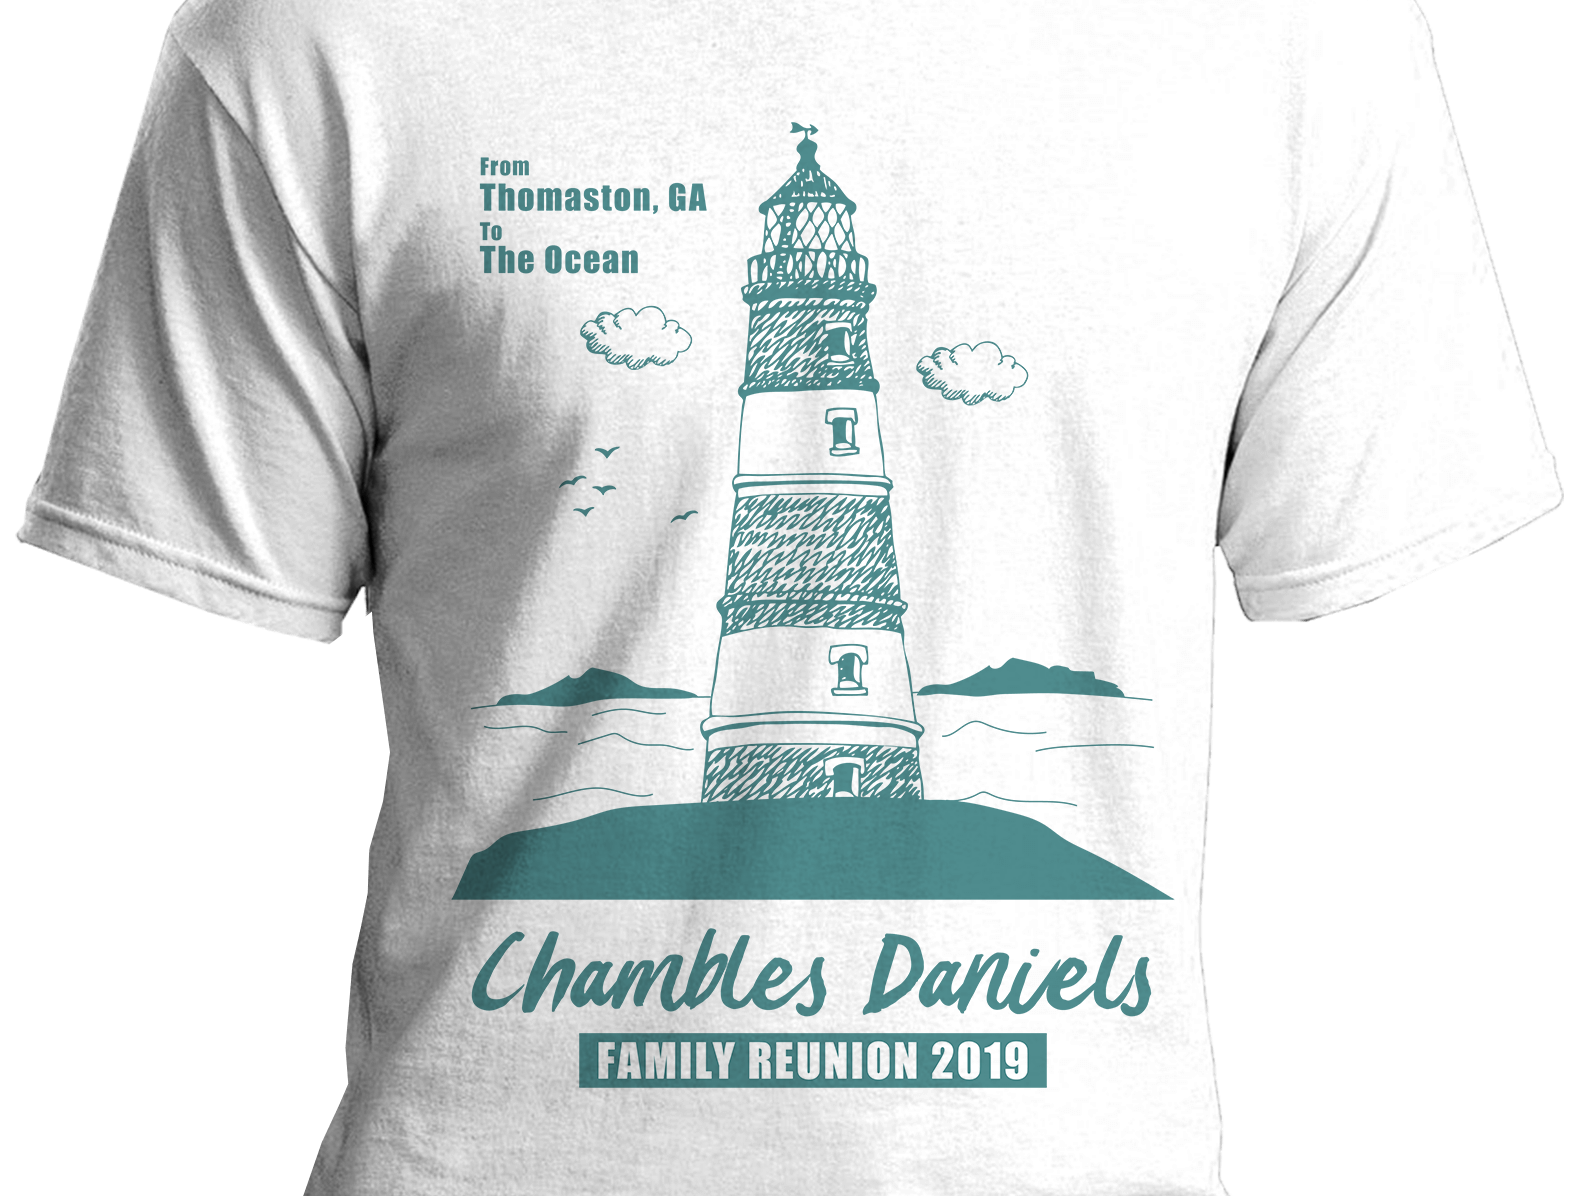 T-shirt Design fiverr freelance designer freelance design freelance art typography family beach reunion lighthouse tshirt design tshirt art tshirt portfolio illustration vector design